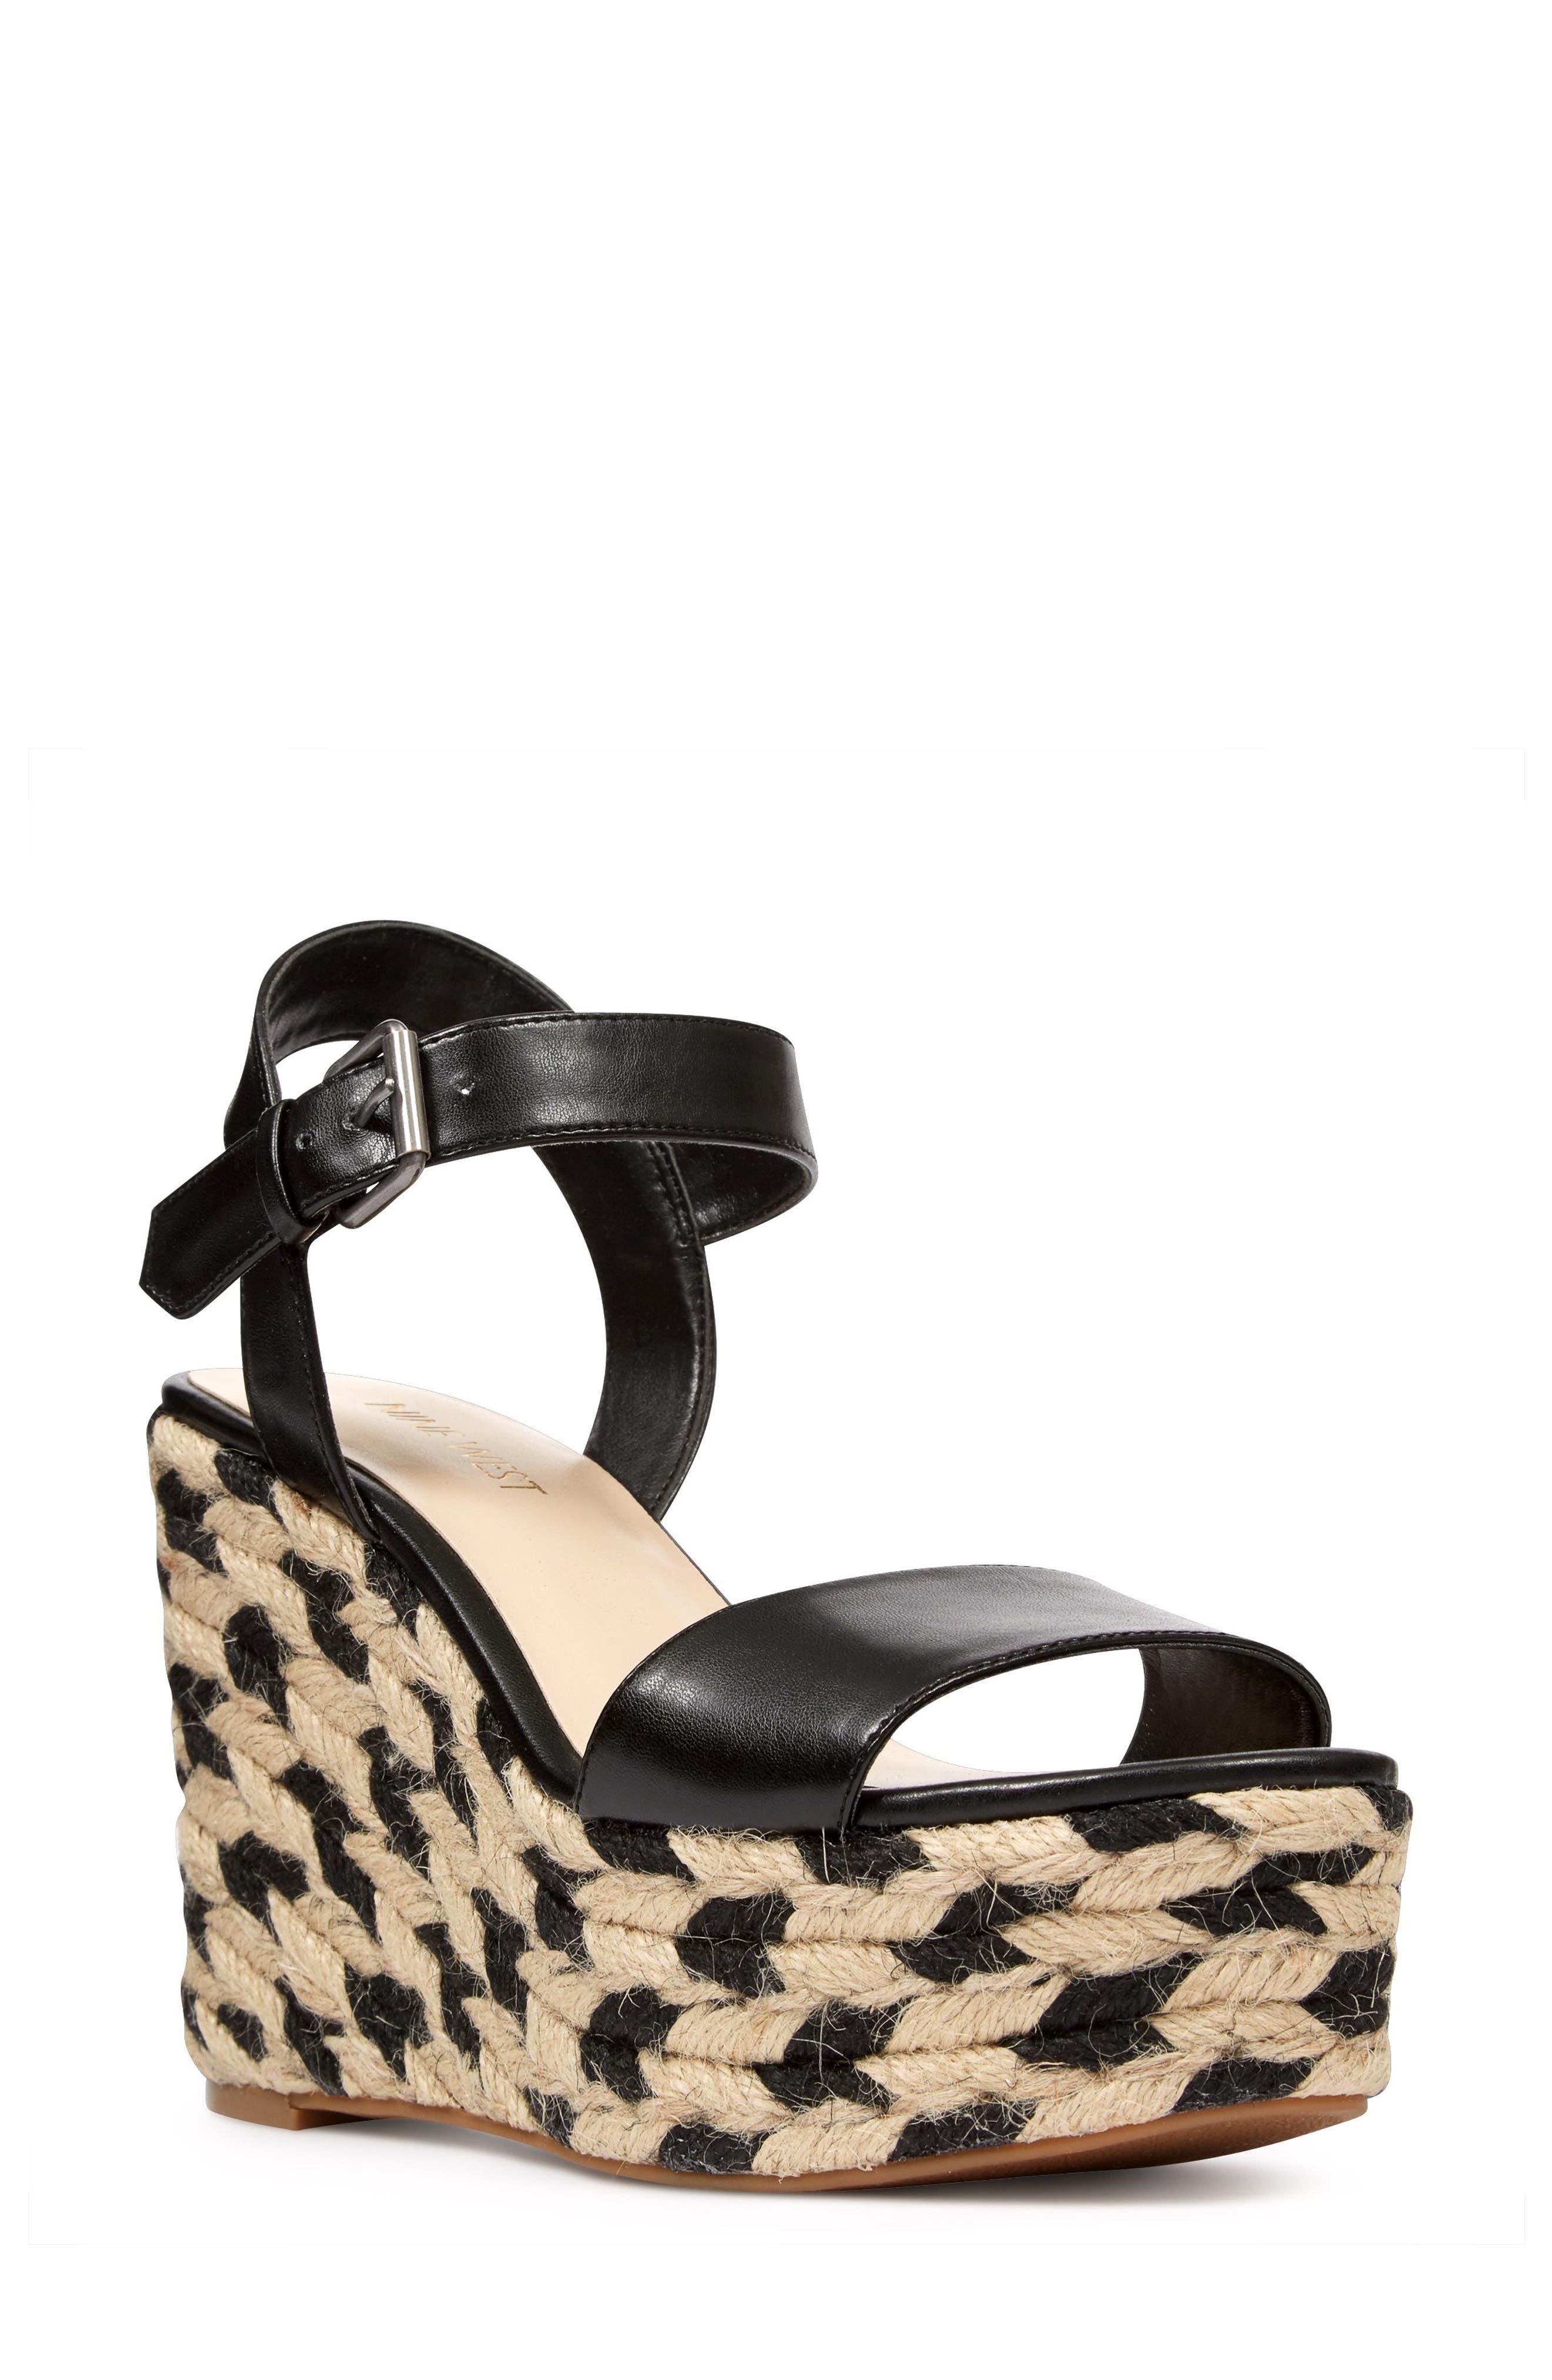 Alternate Image 1 Selected - Nine West Do It Right Platform Wedge Sandal (Women)